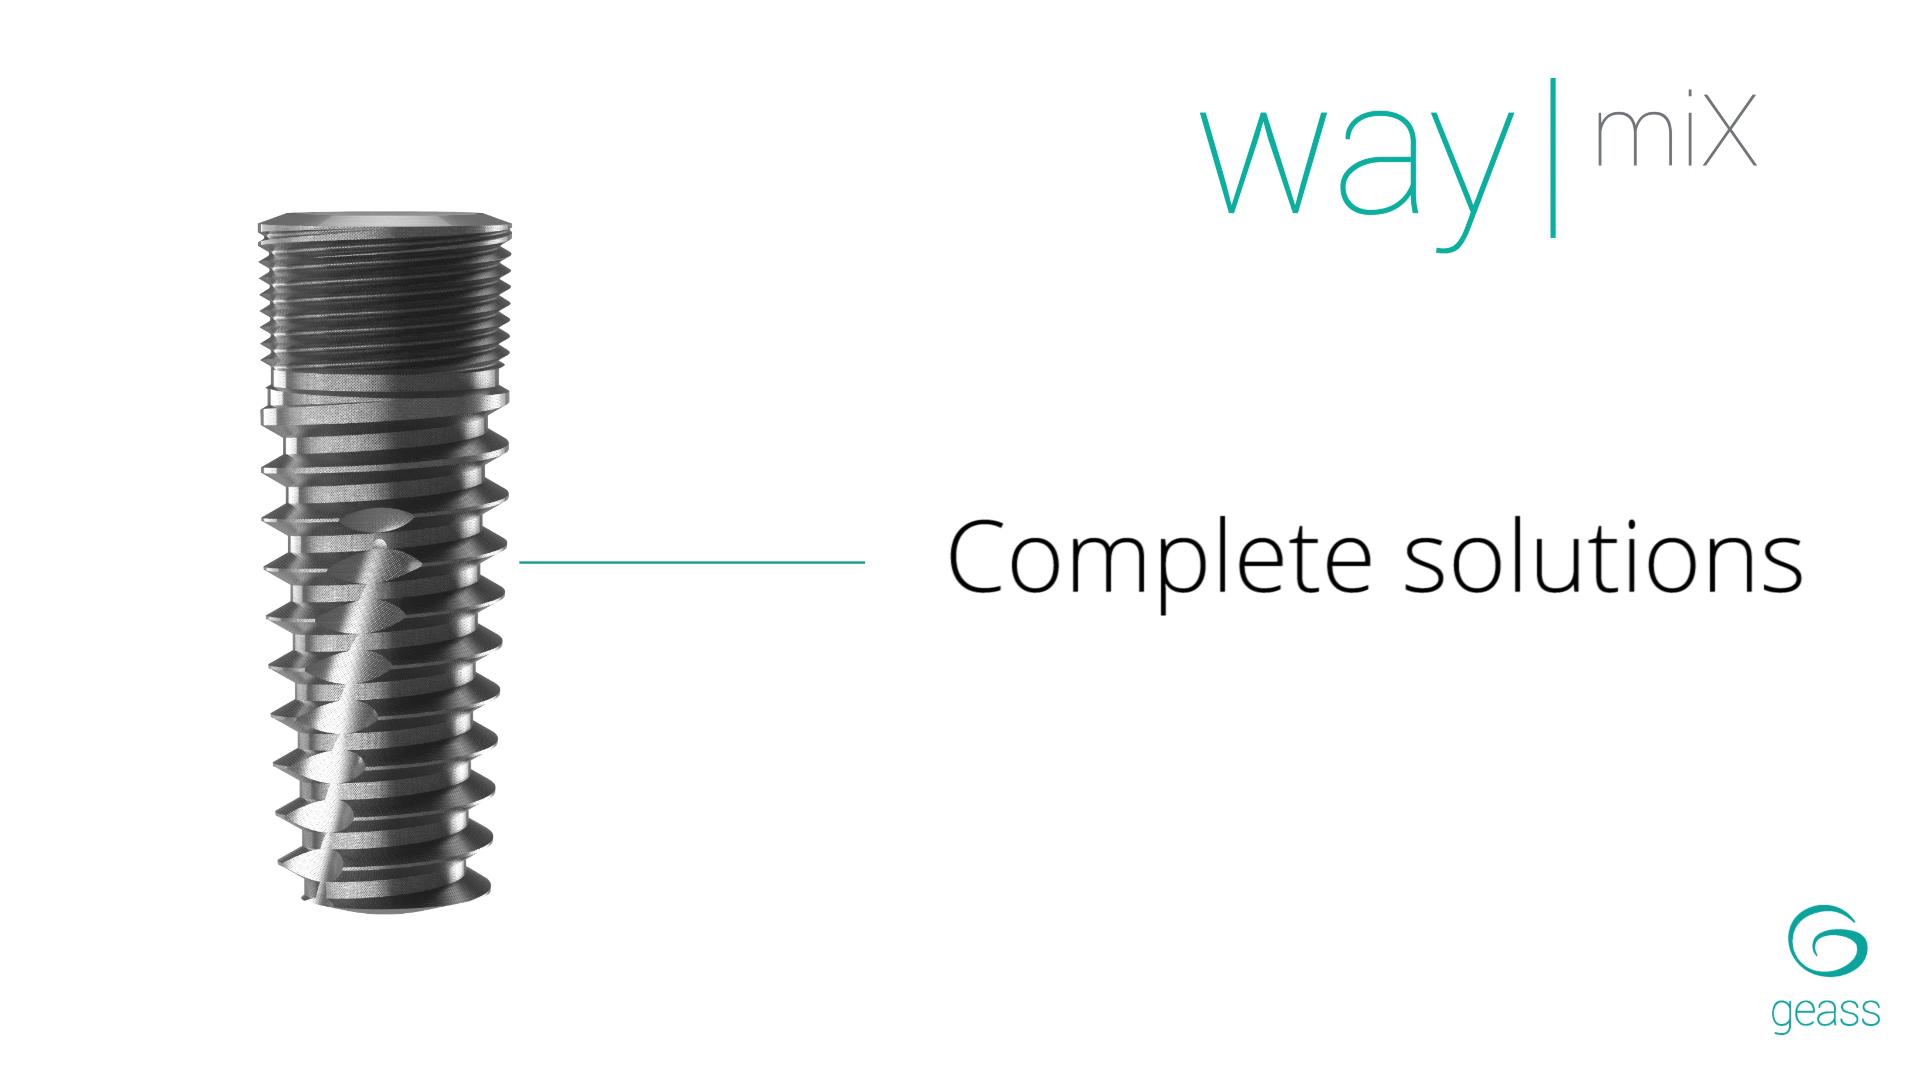 Geass - way mix complete solutions